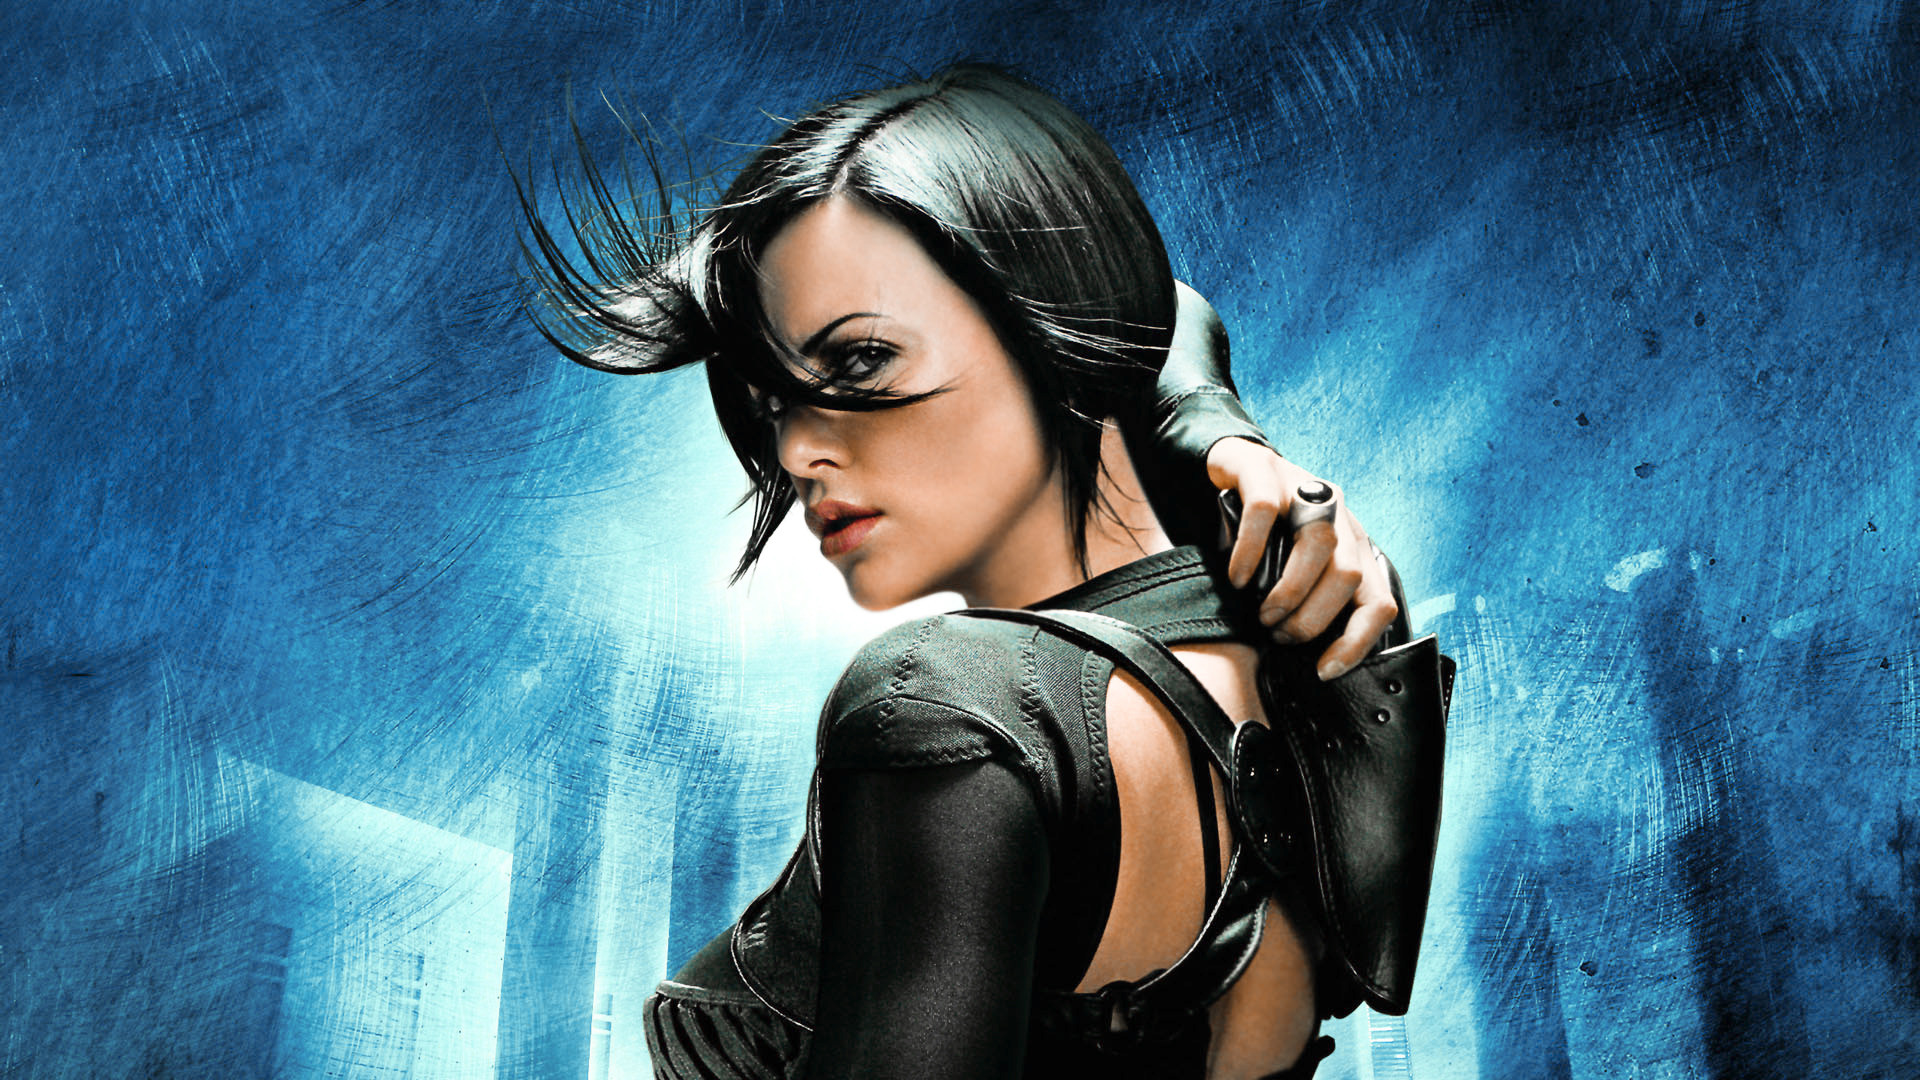 Top Heroic Female Characters: Renegade Cinema Staff Picks